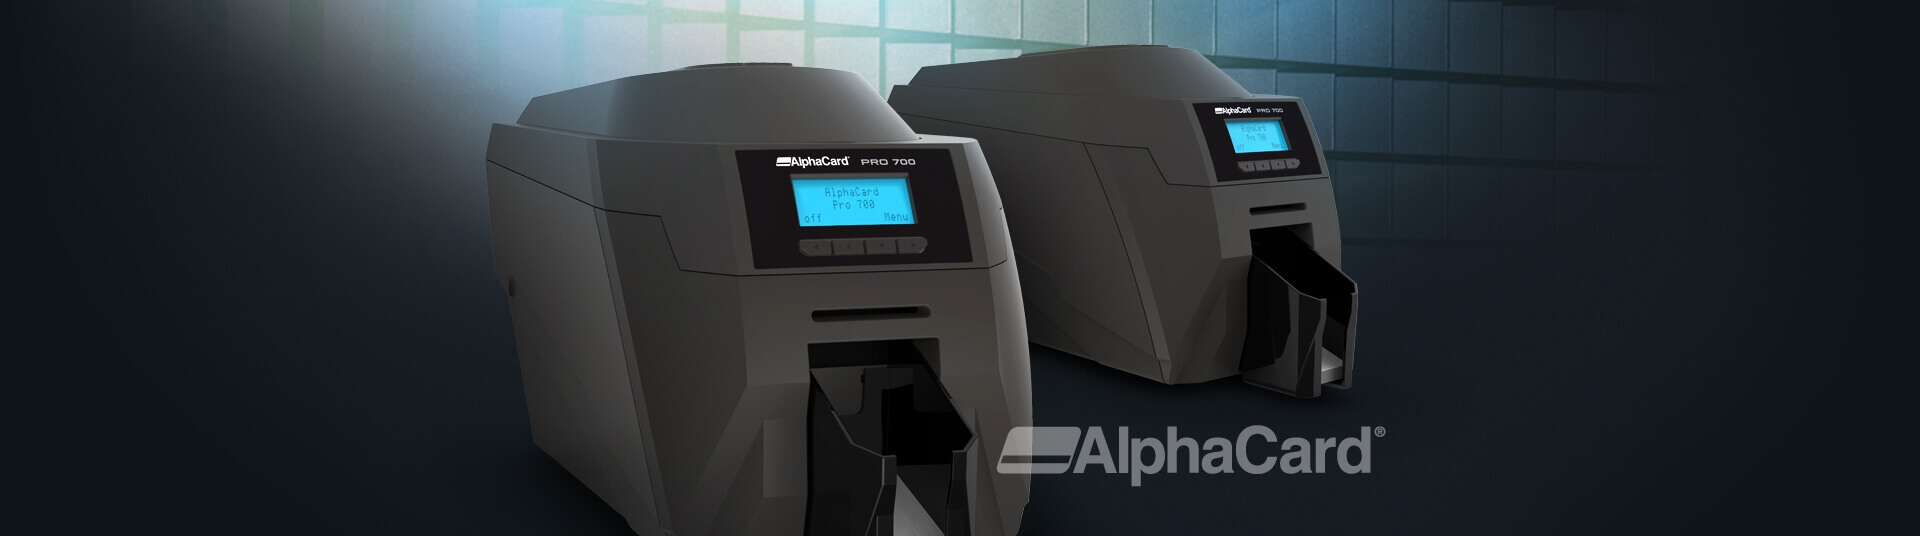 AlphaCard PRO 700 ID Card Printers